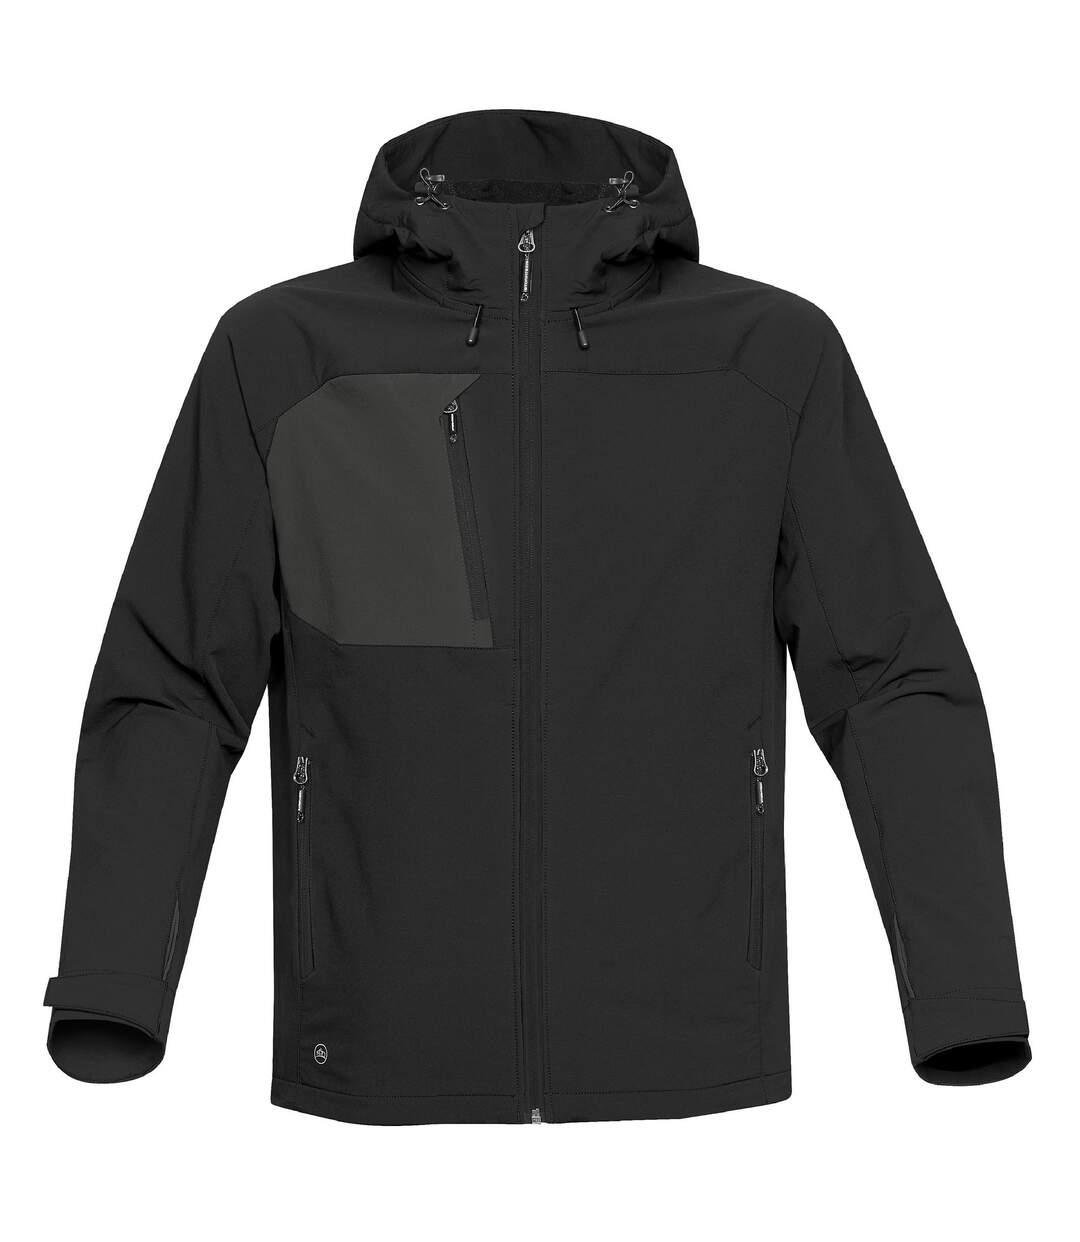 Stormtech Mens Sidewinder Shell Jacket (Black/Black) - UTBC3879